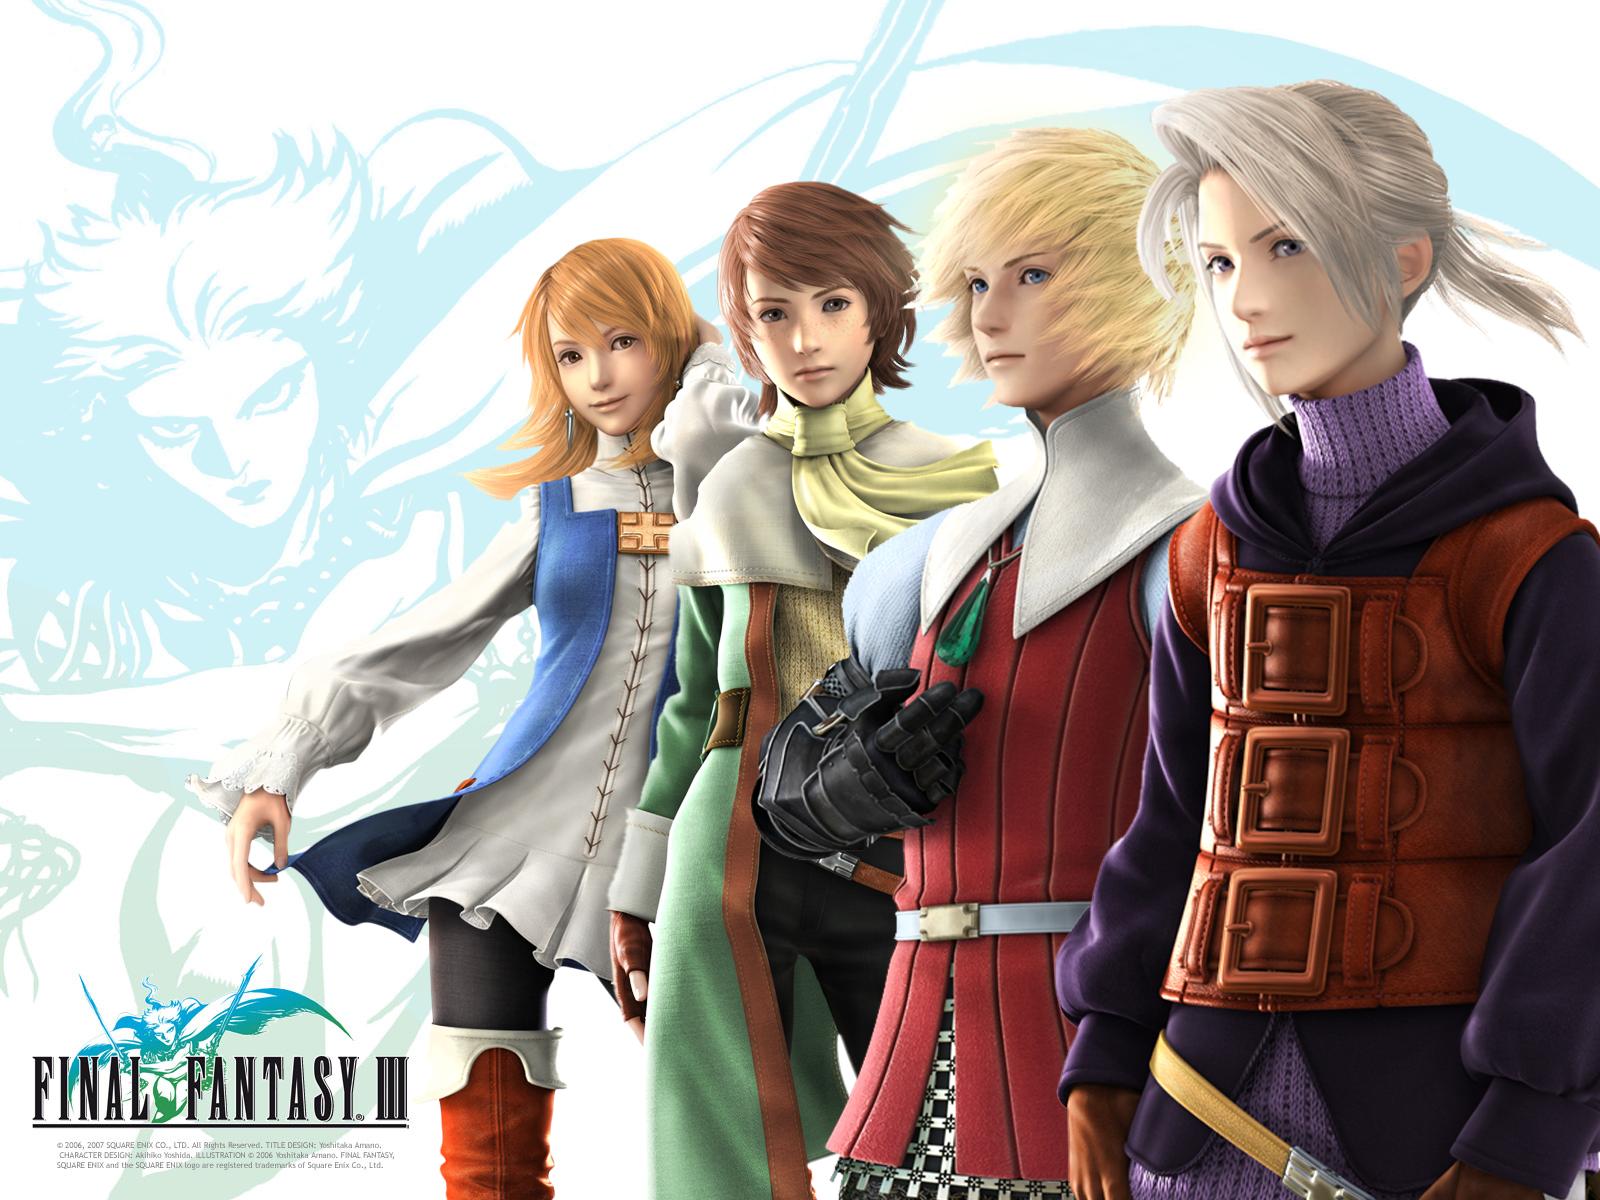 Final Fantasy Iii Wallpaper 5 Fotos